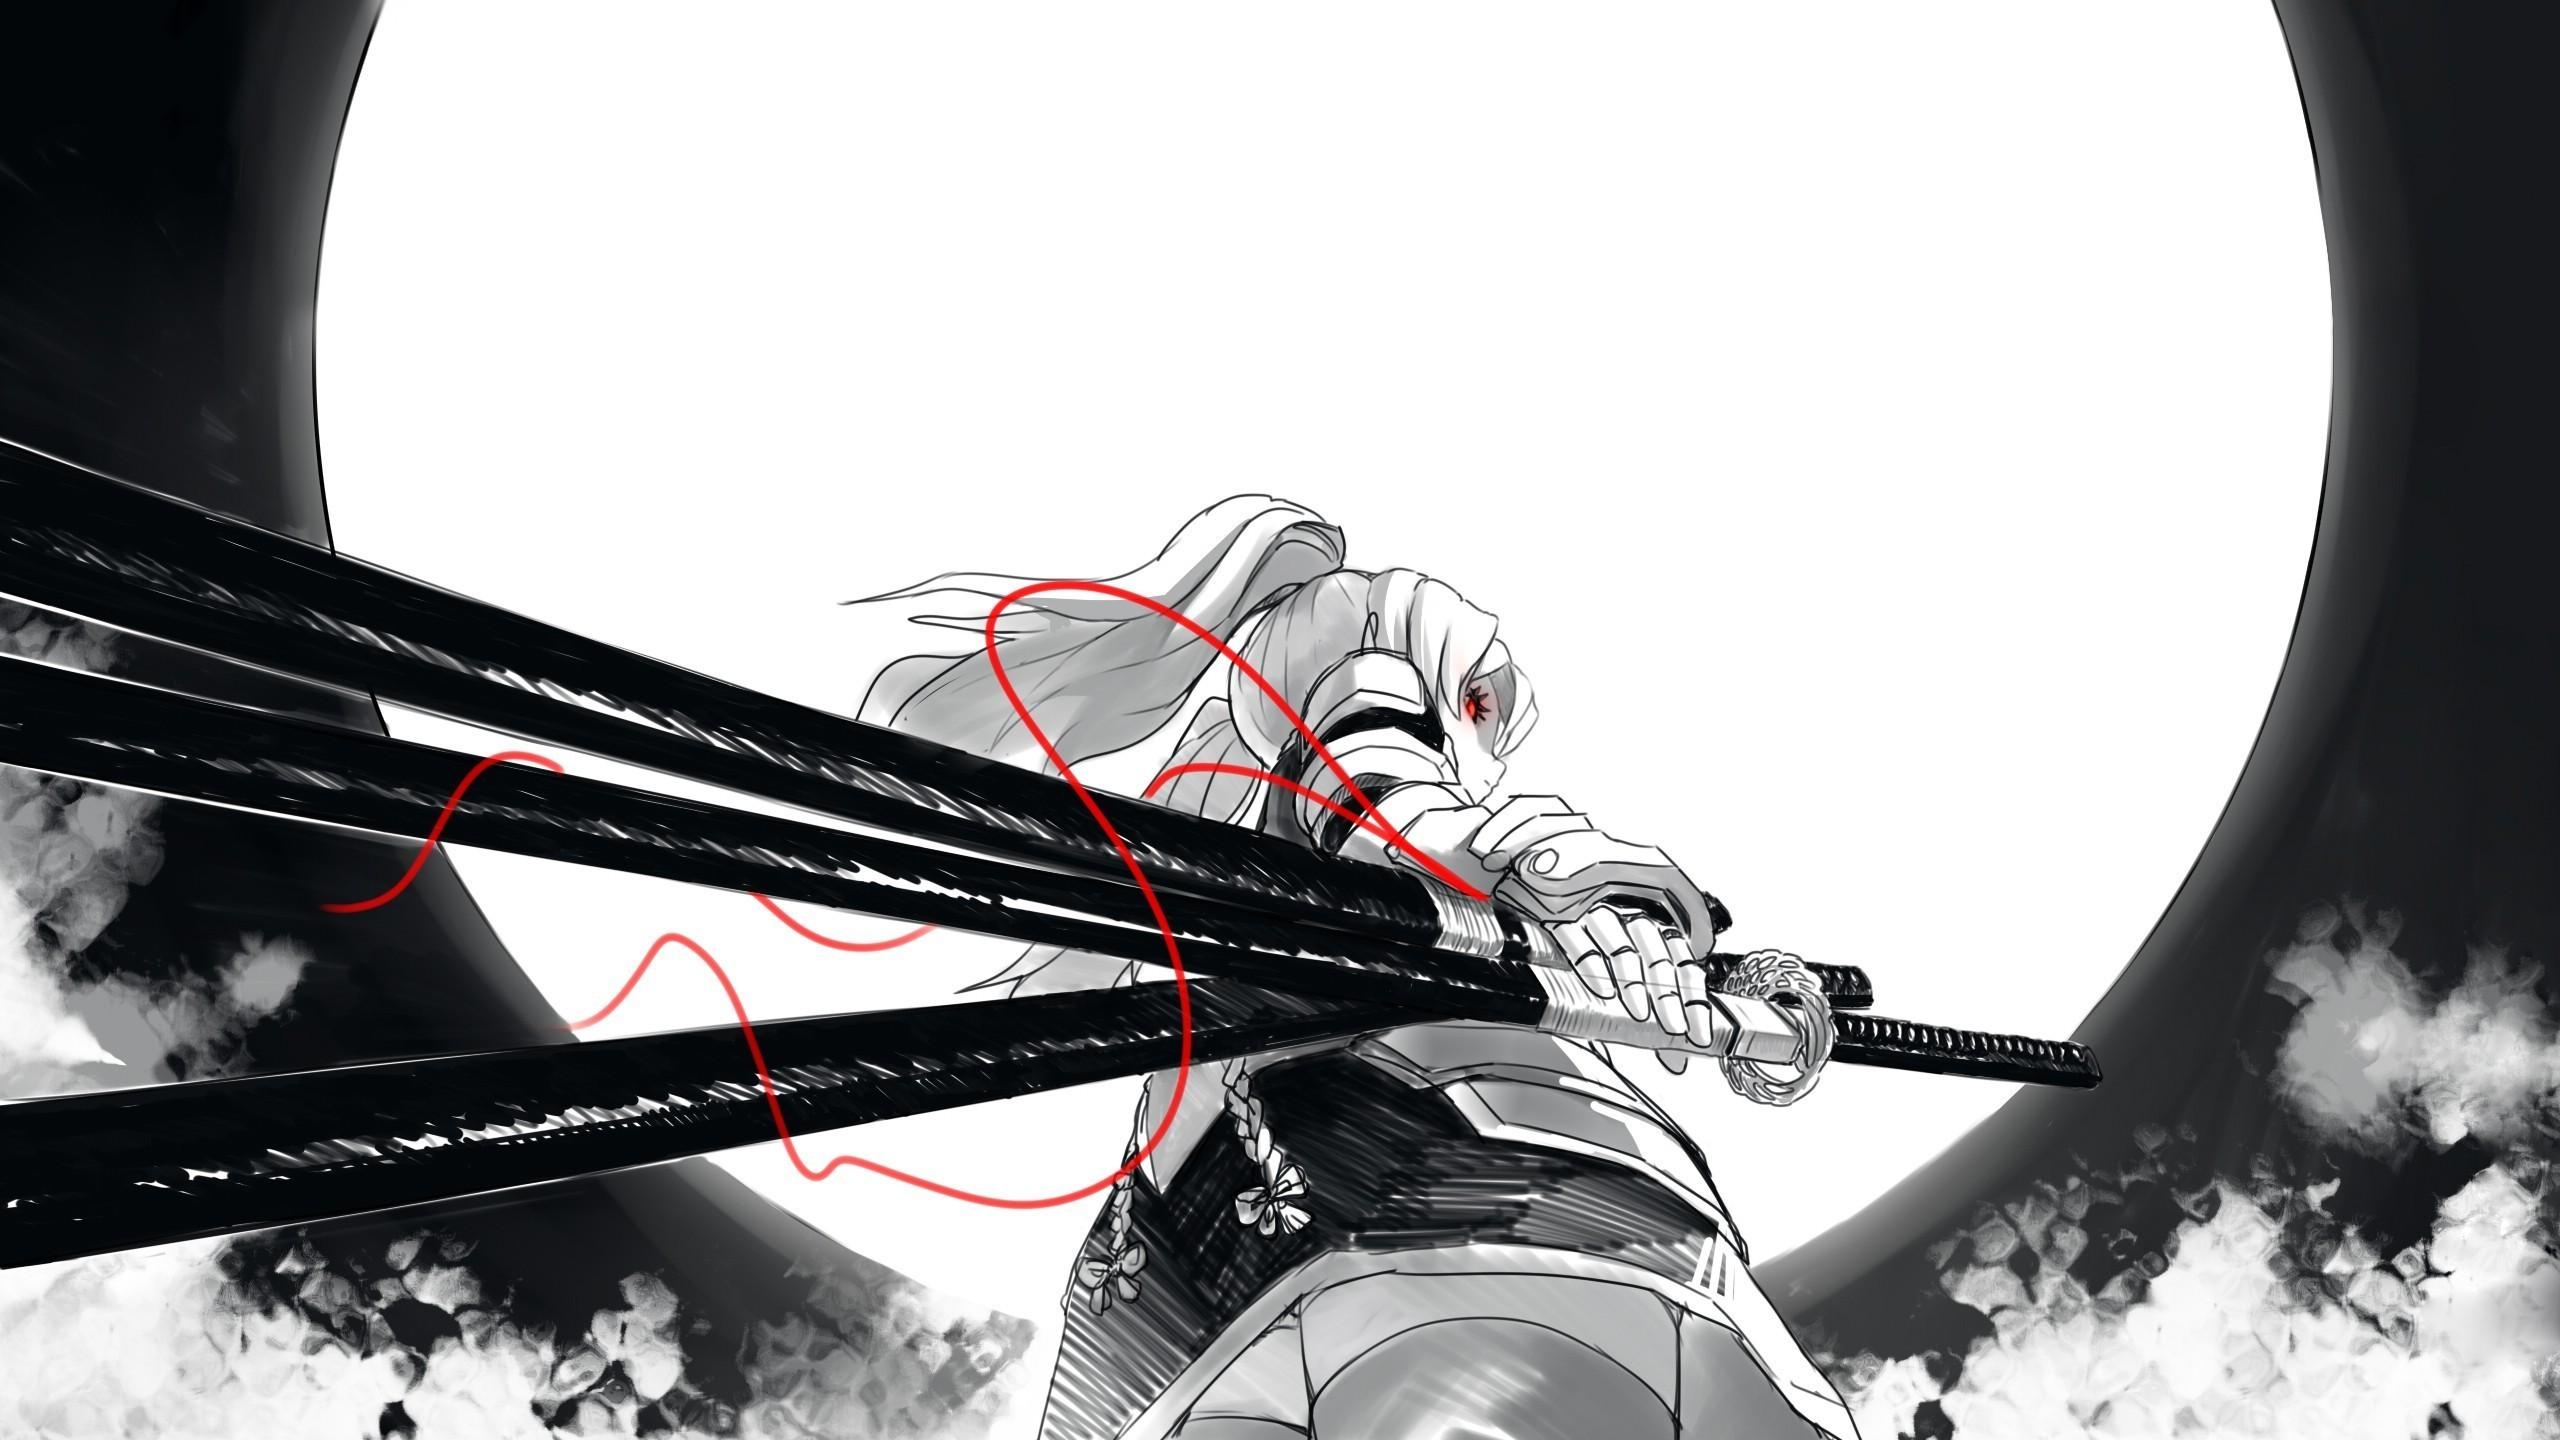 Res: 2560x1440, Samurai girl Wallpaper